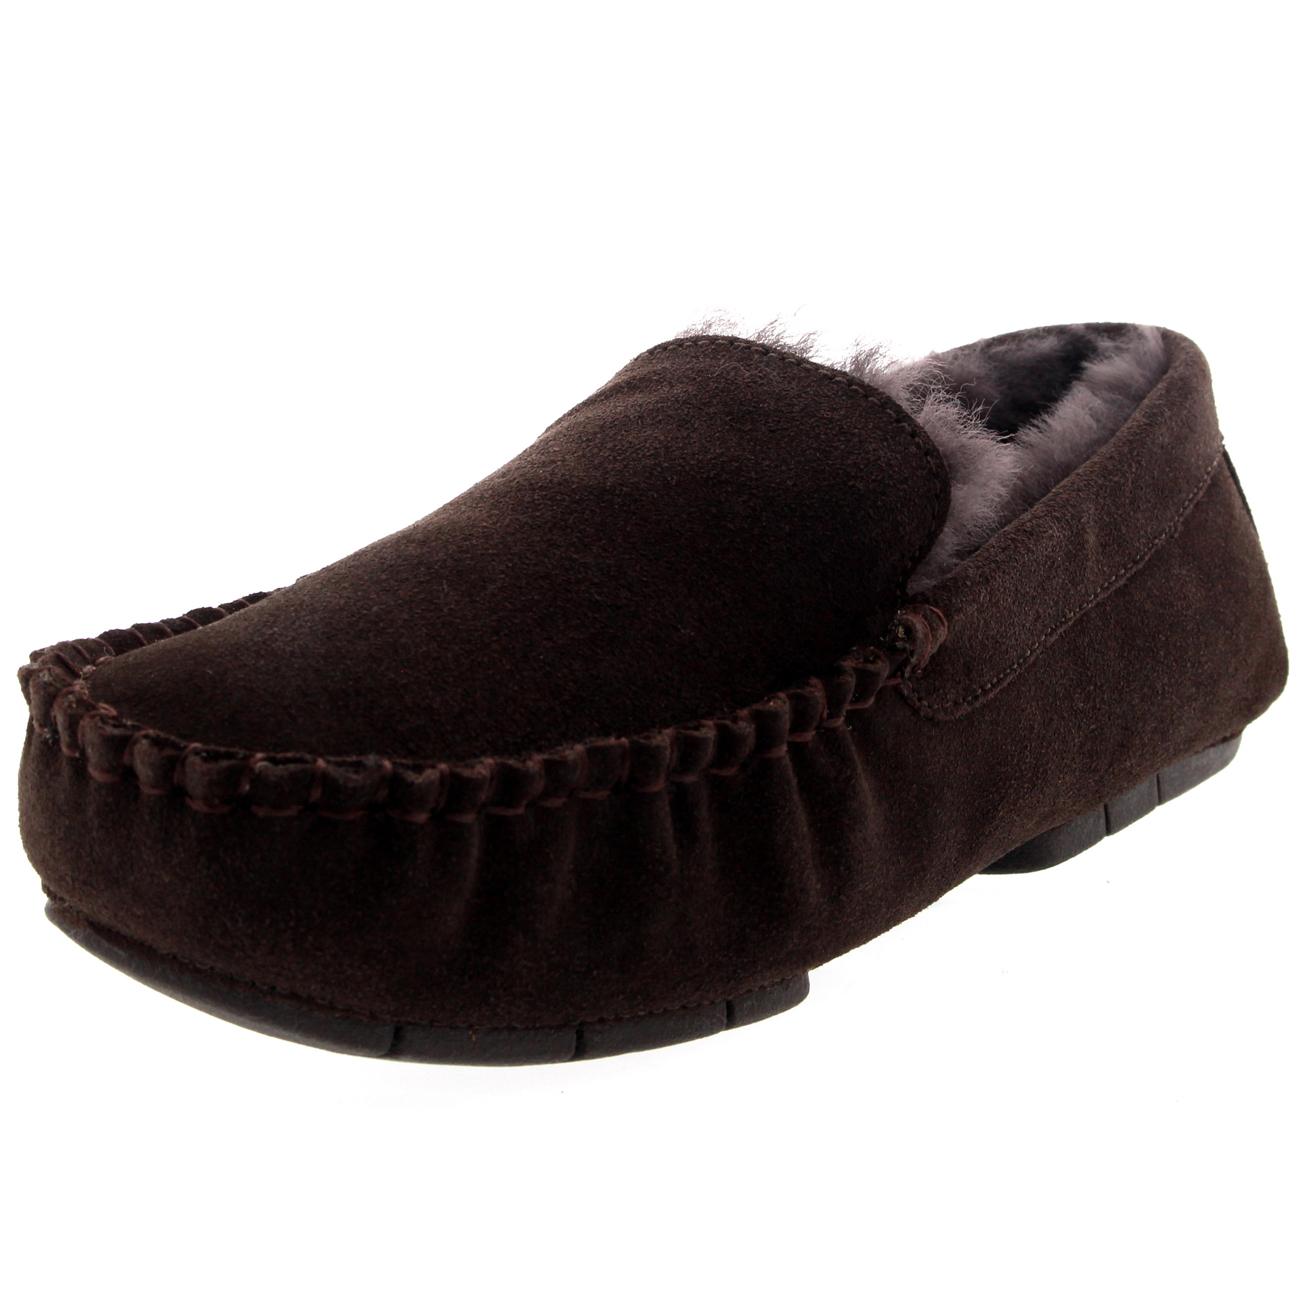 Sheepskin Lined Shoes Mens